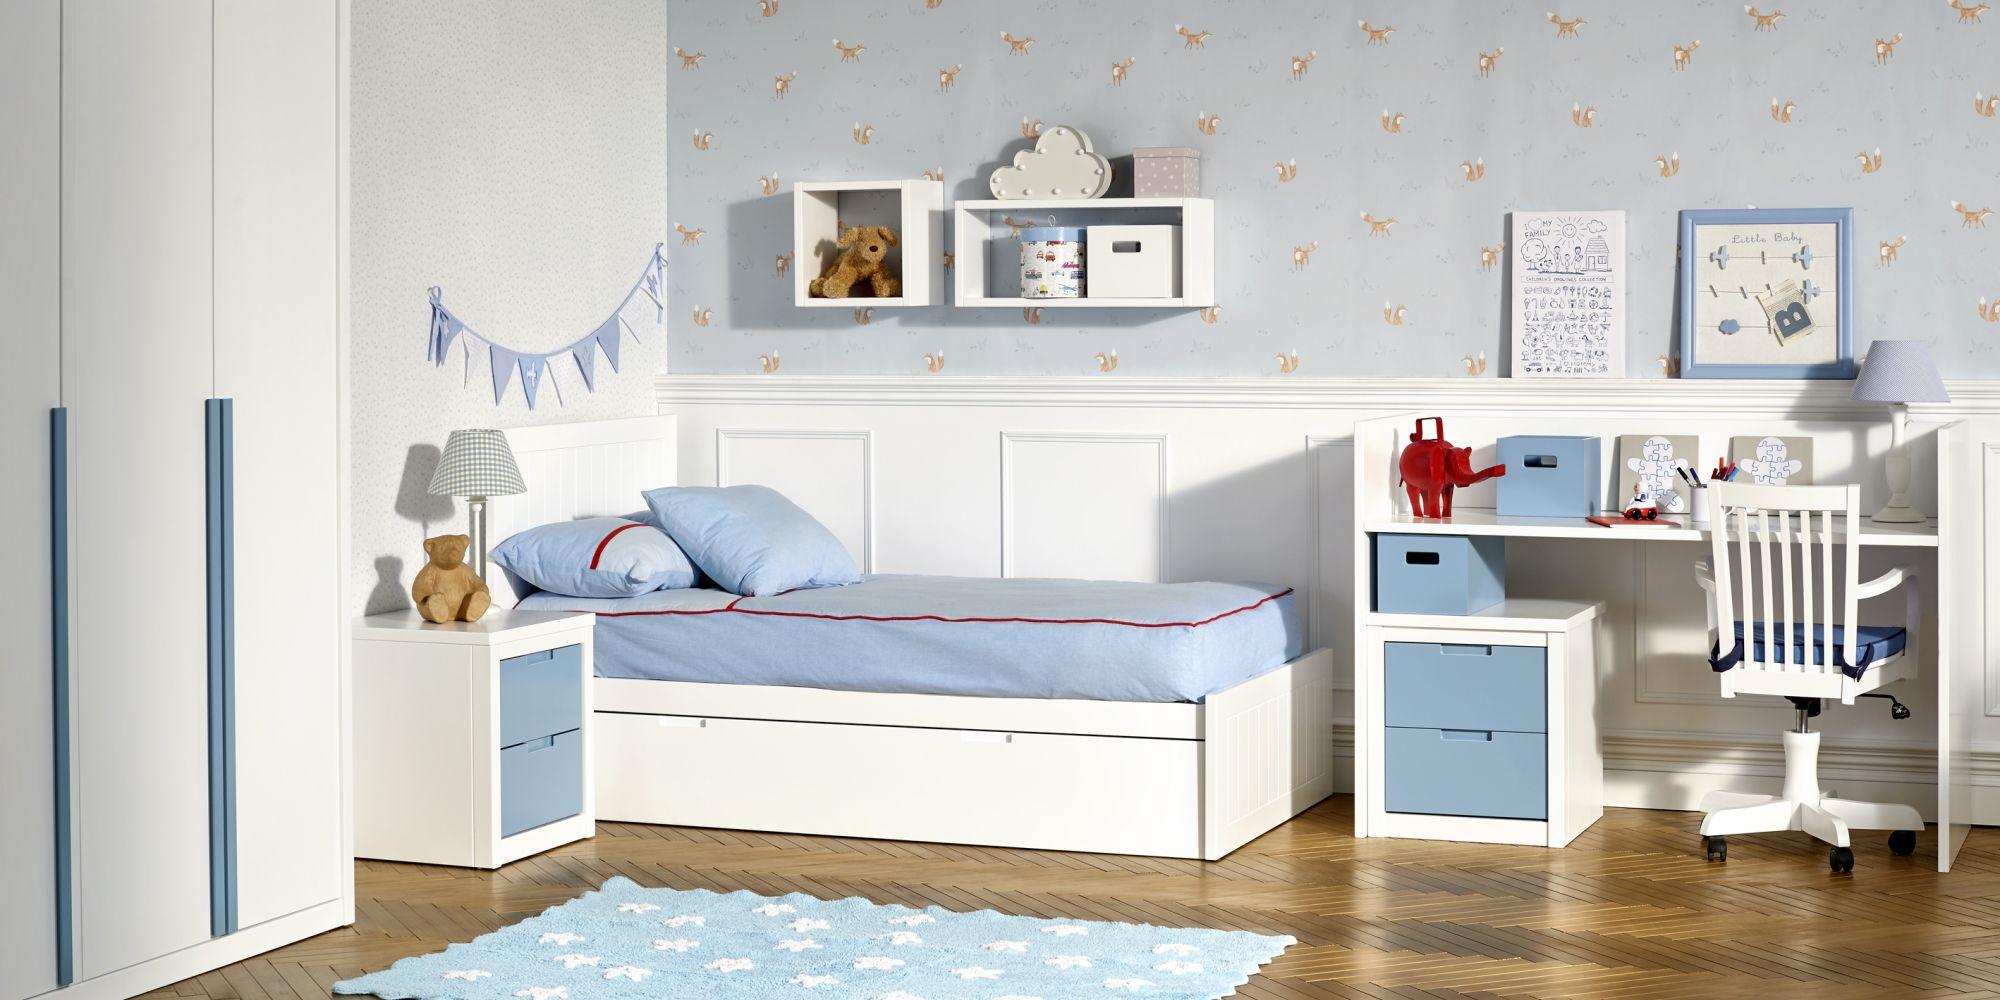 Convertible desmontado para bebé con cama